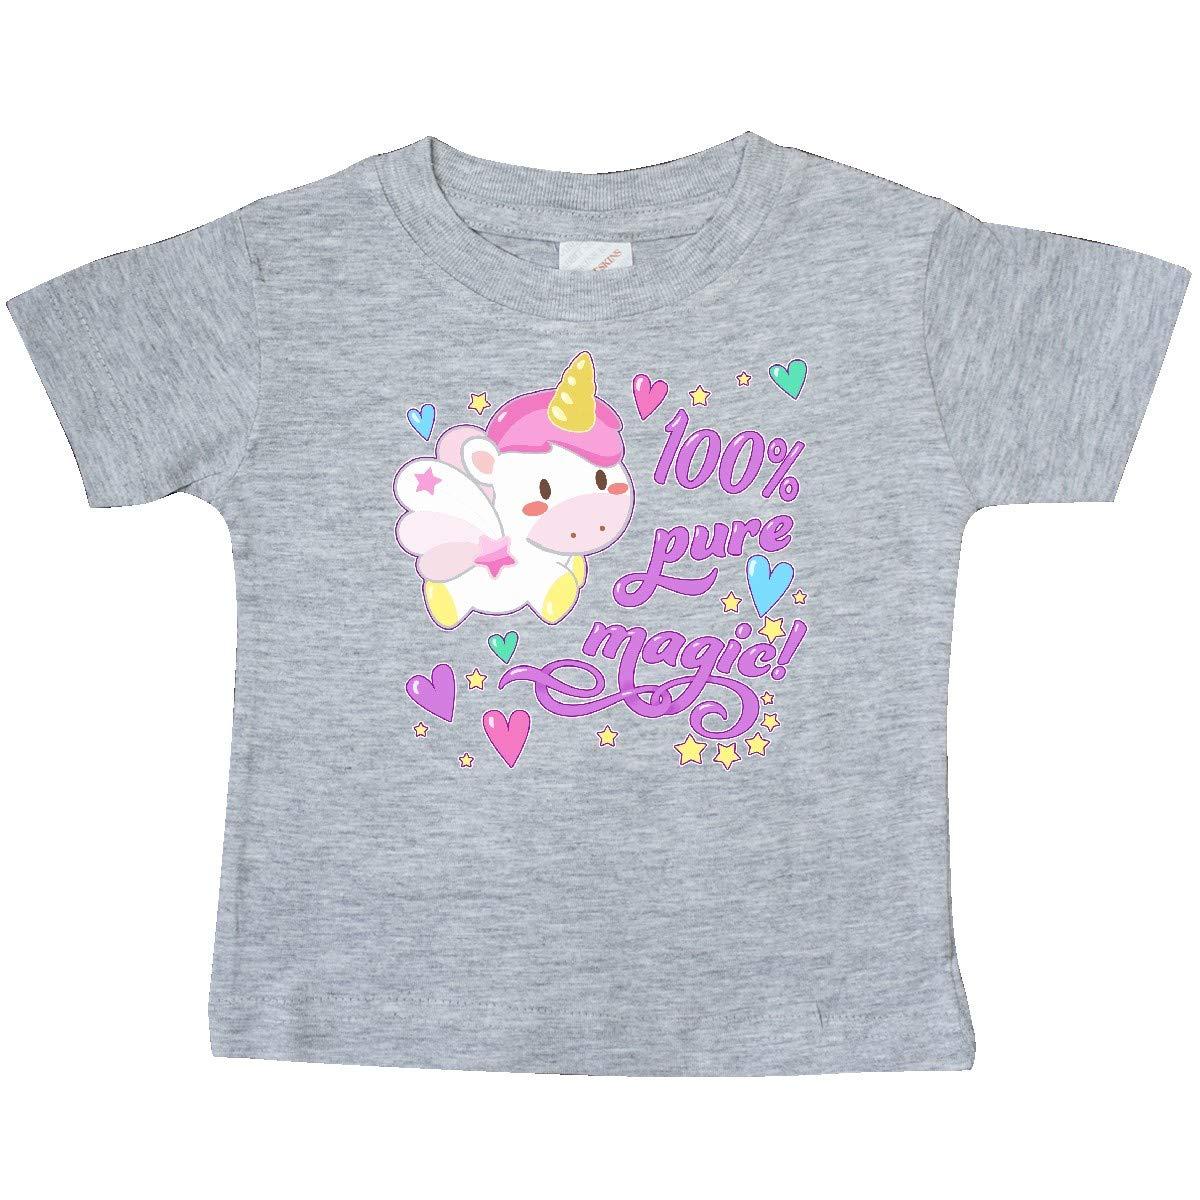 Cute Unicorn Baby T-Shirt inktastic 100 Percent Pure Magic